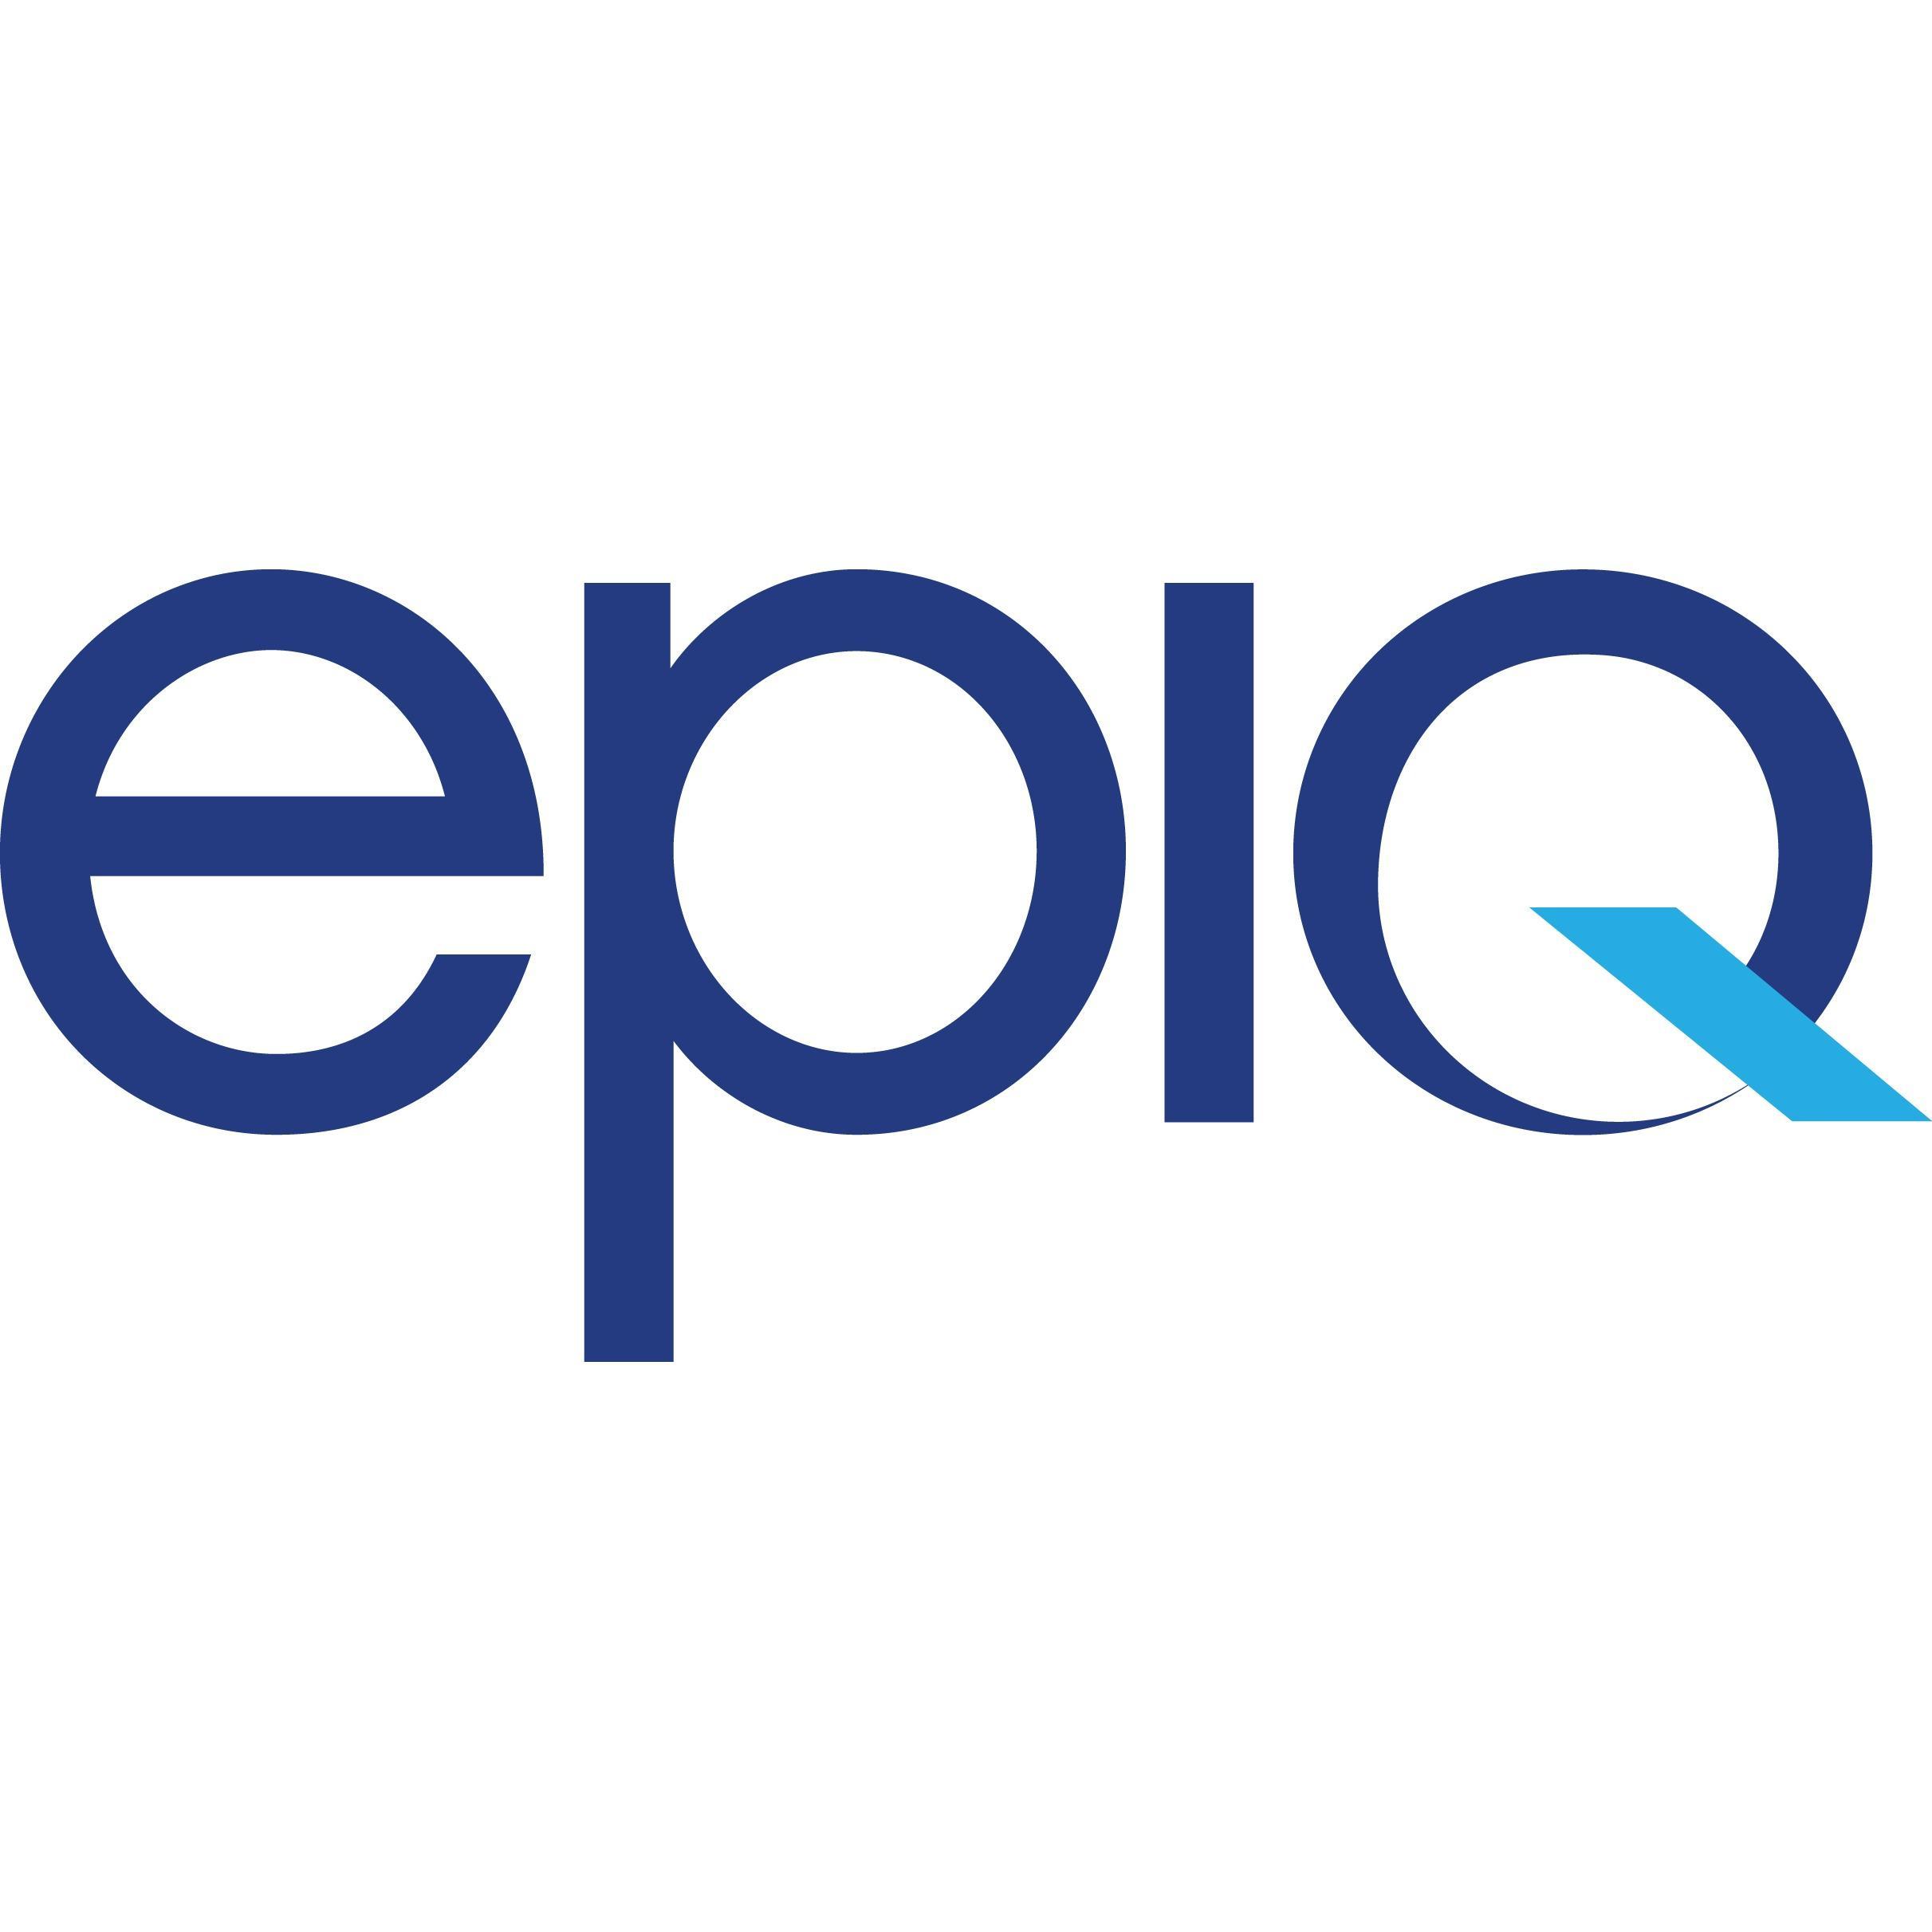 Epiq - London, London E14 9SH - 020 3750 5737 | ShowMeLocal.com